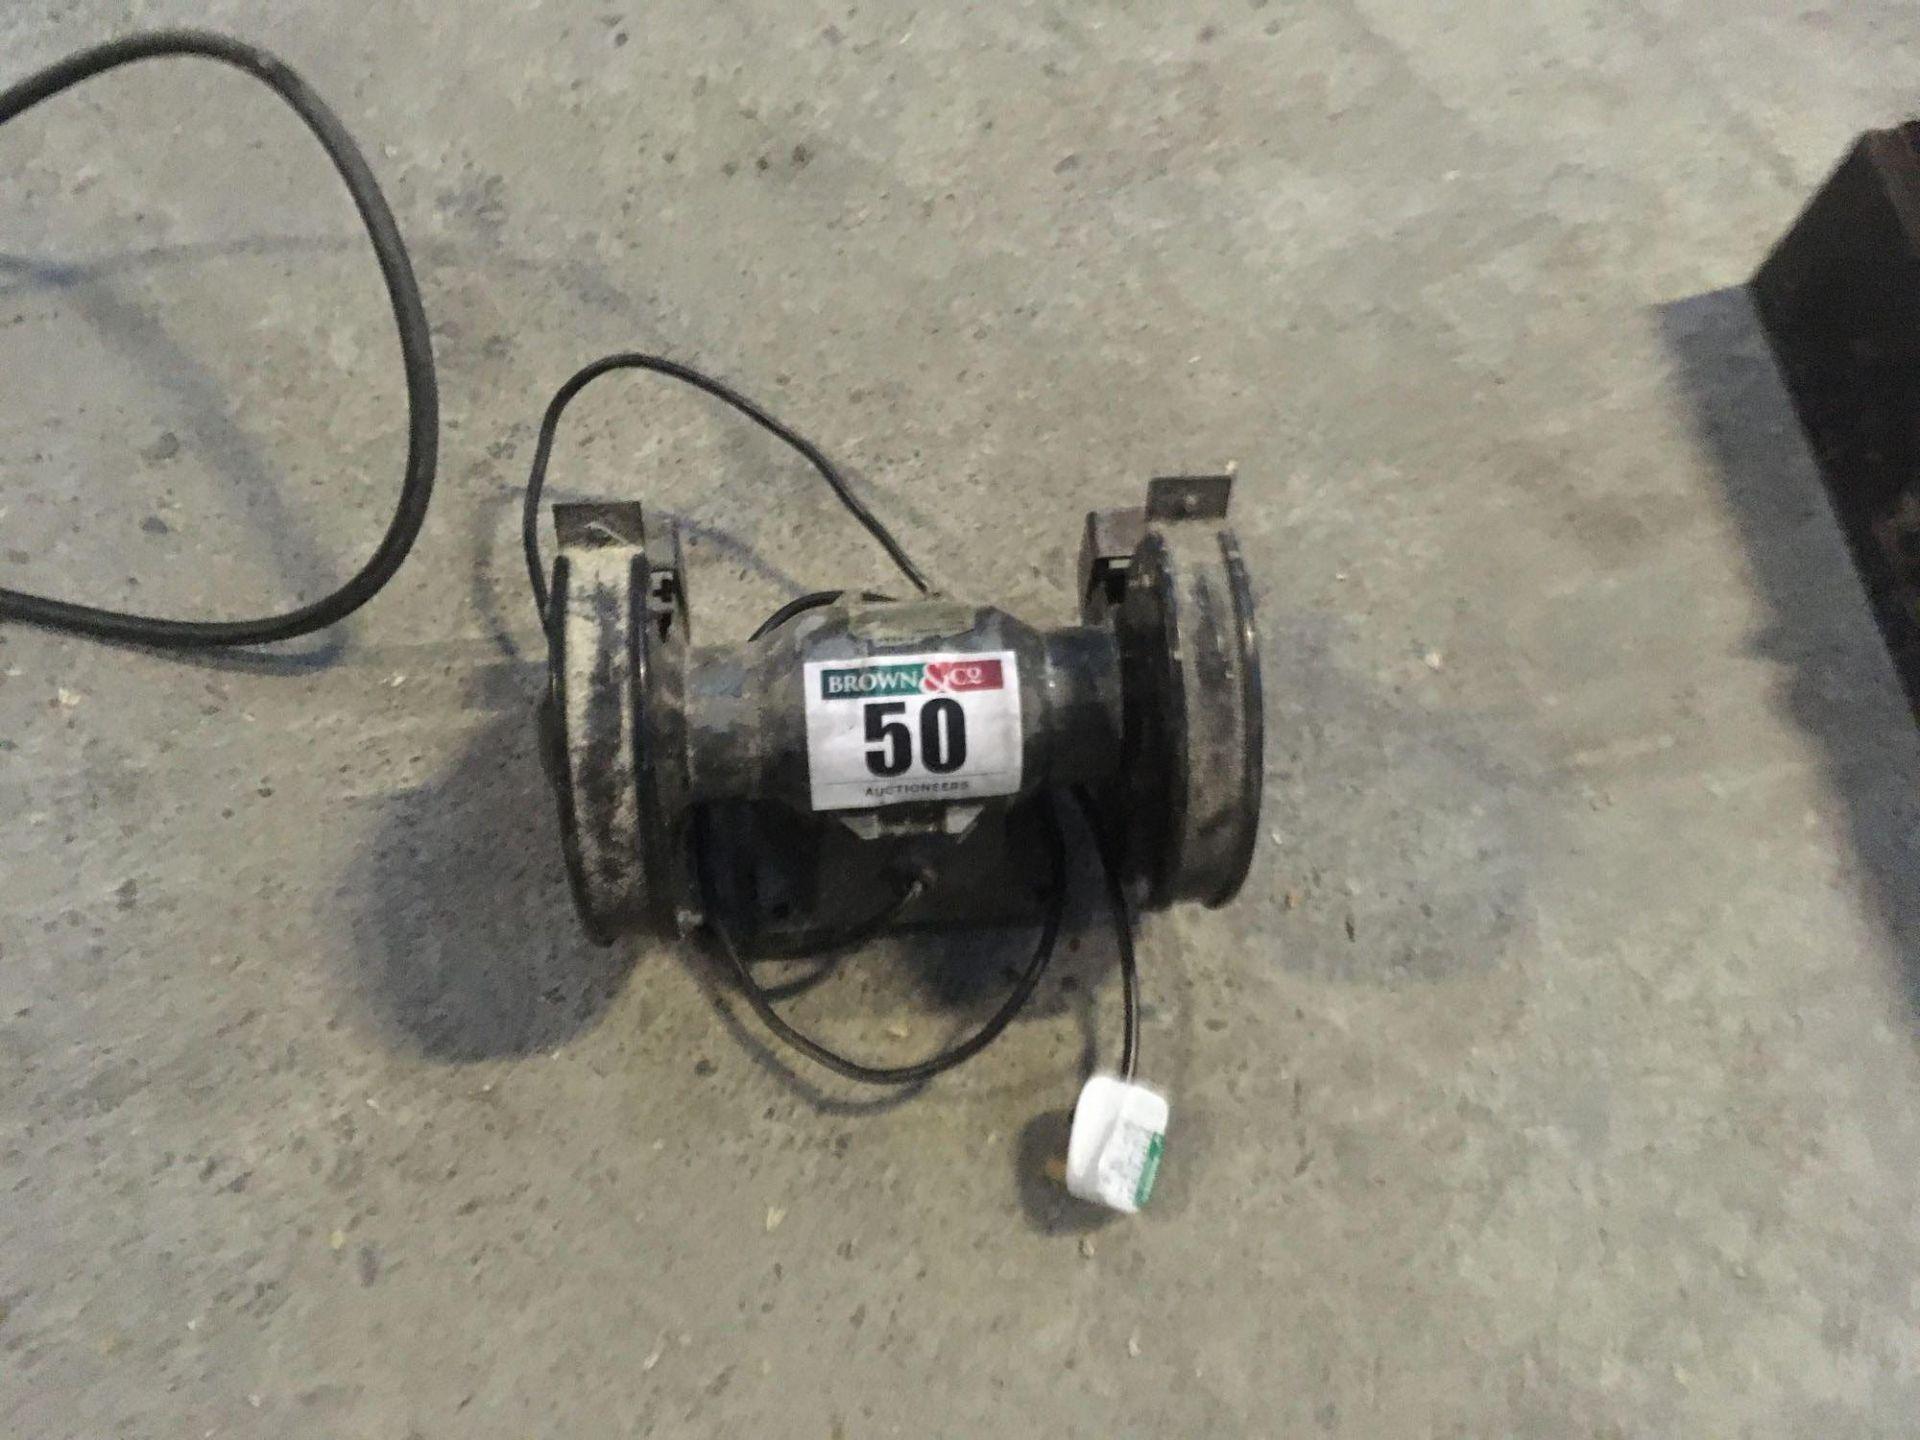 Bench grinder, single phase